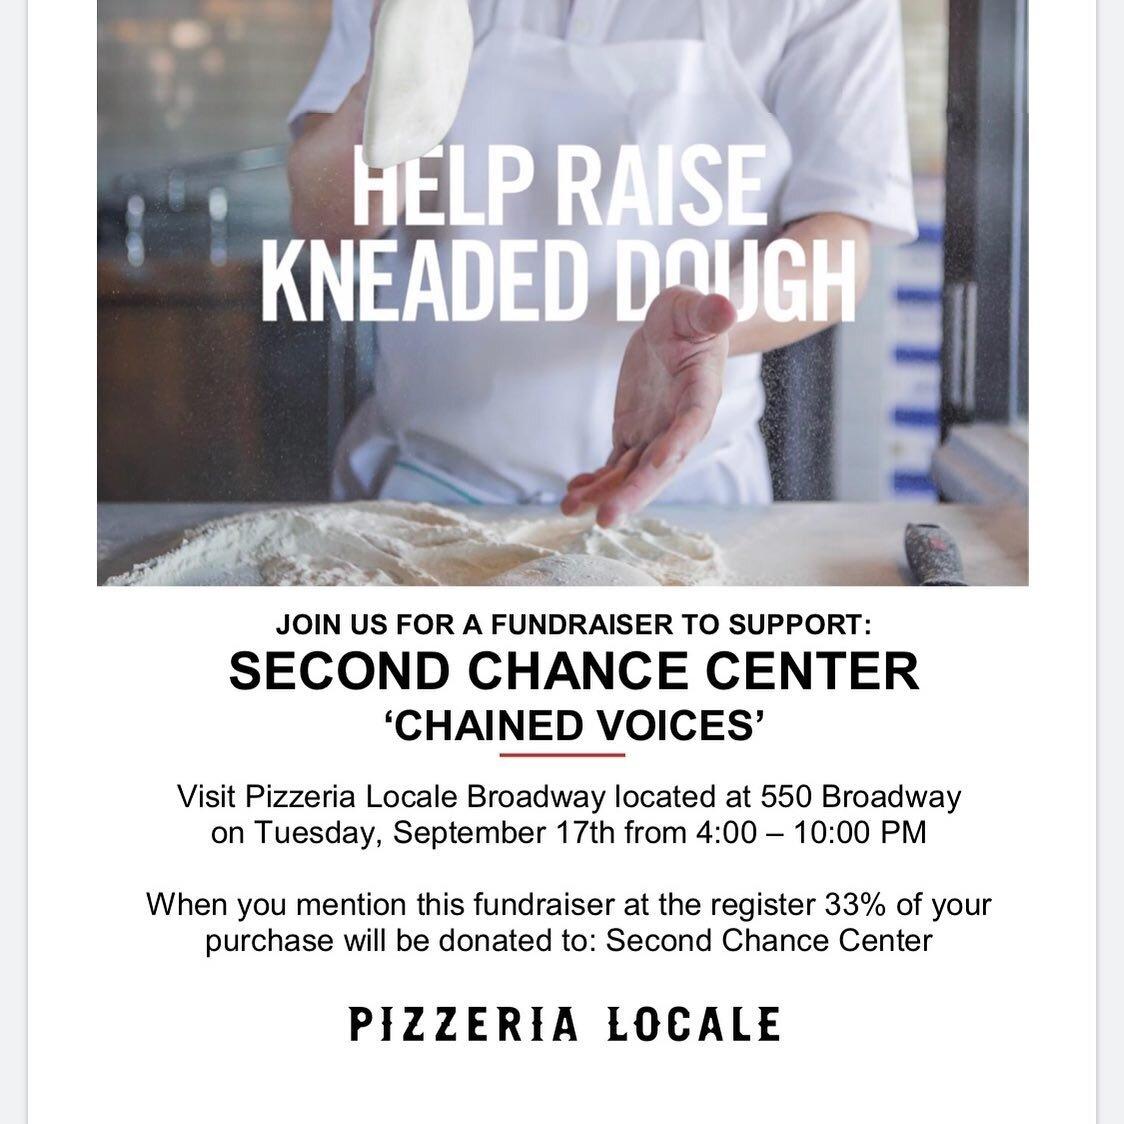 Pizzeria Locale Flyer.jpg